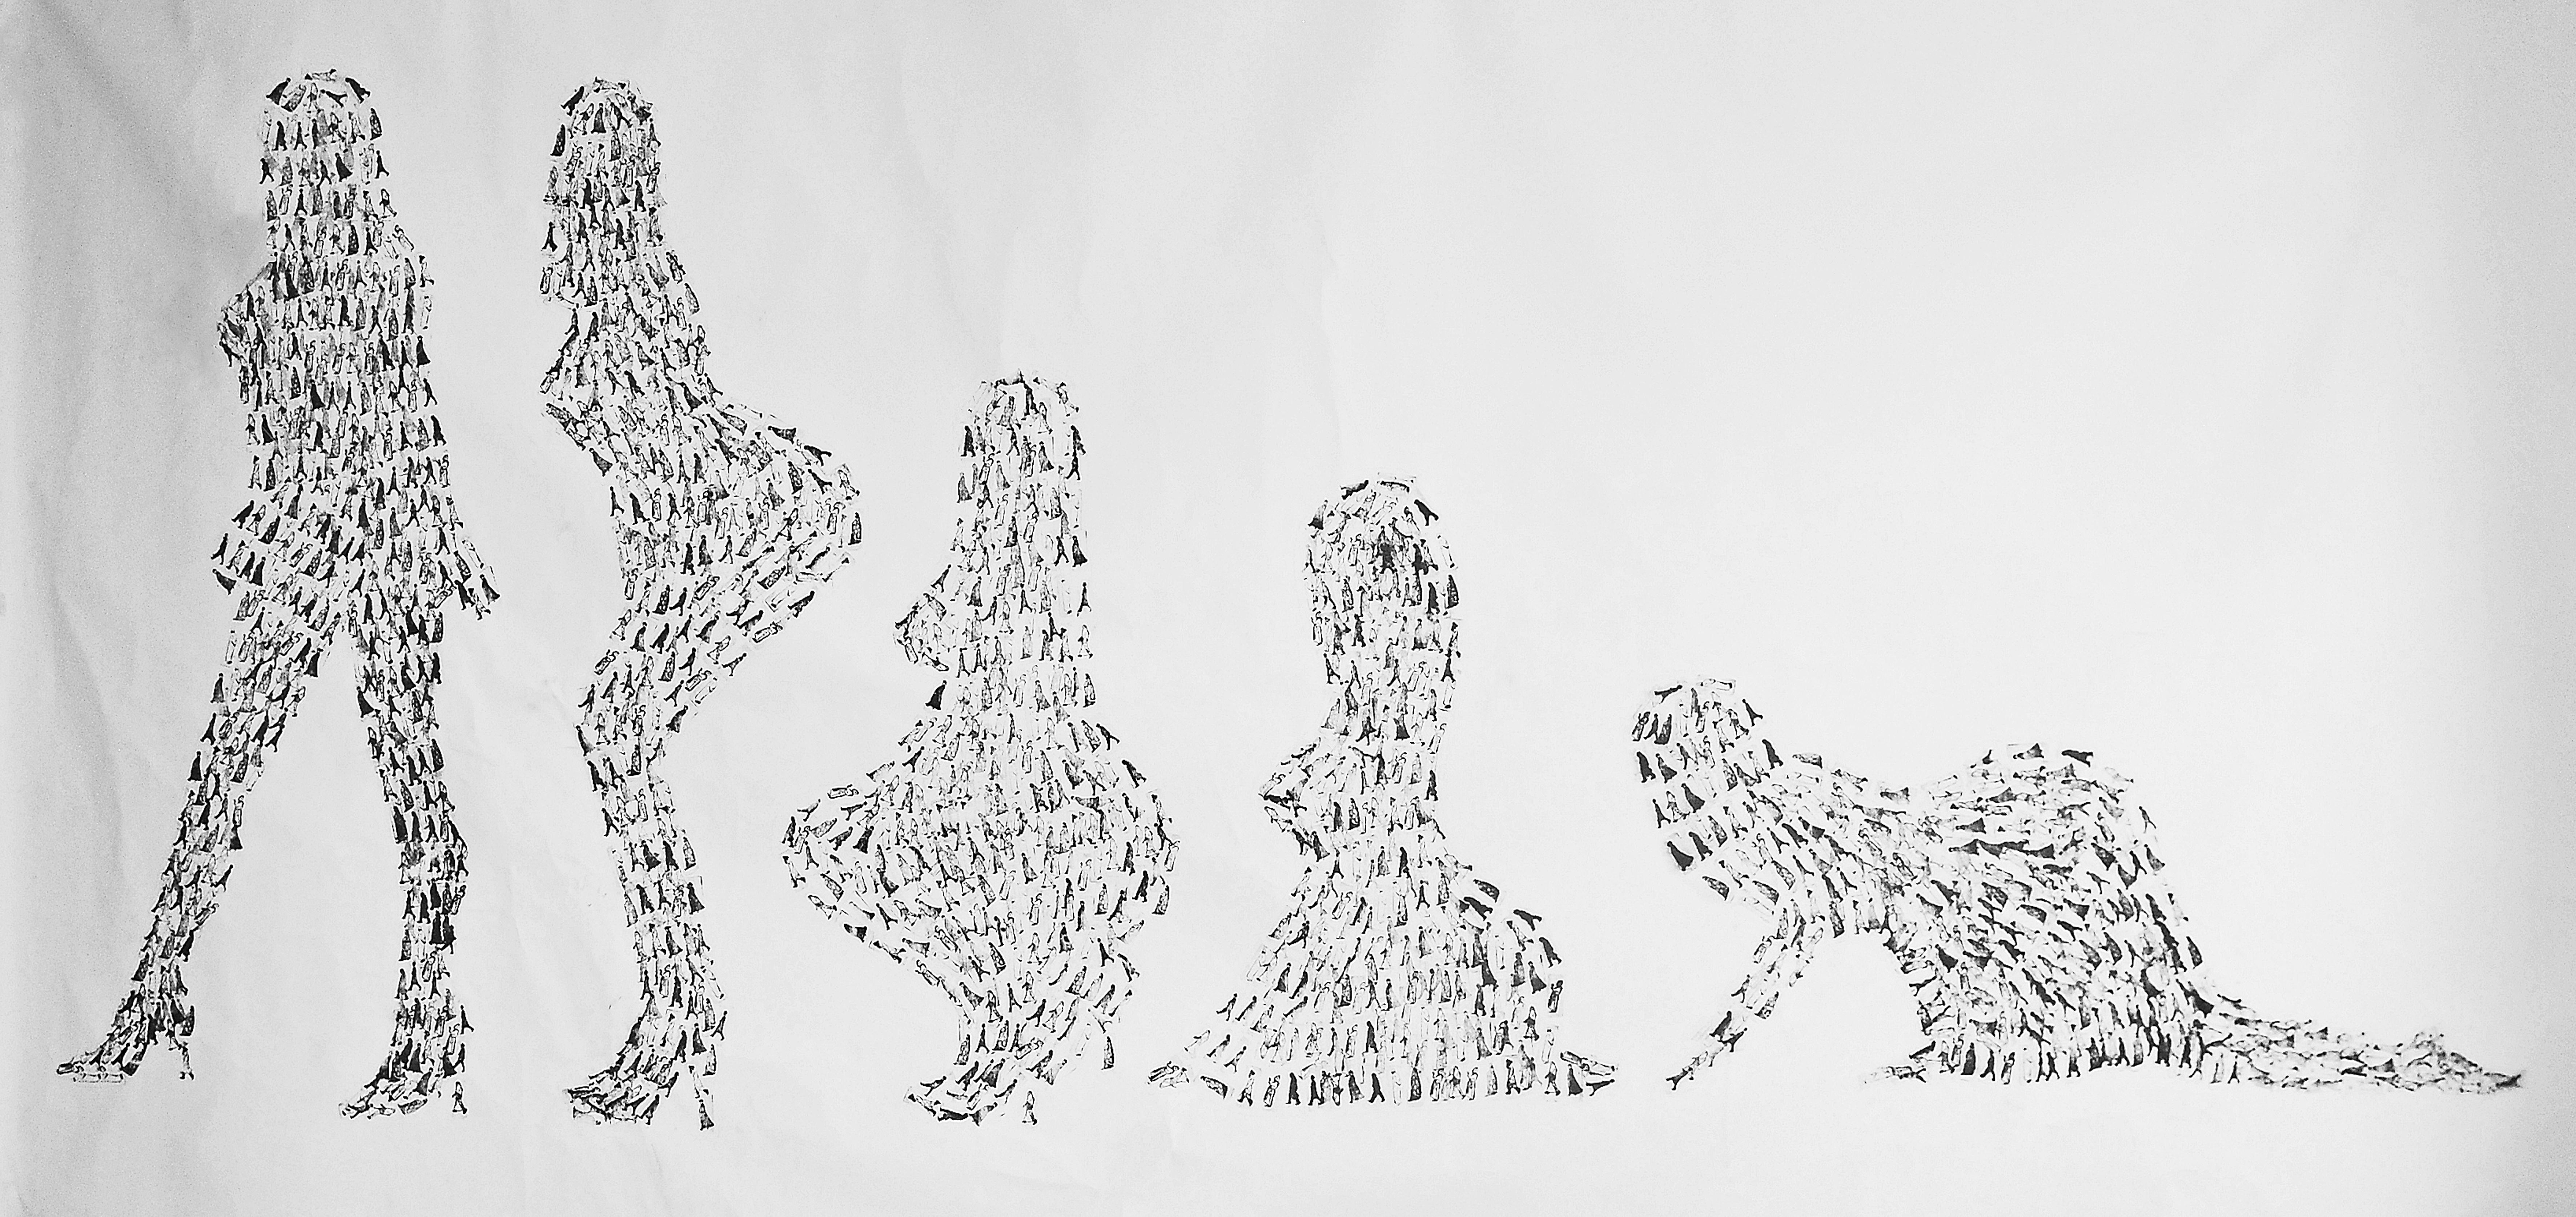 R-evolution, 2014